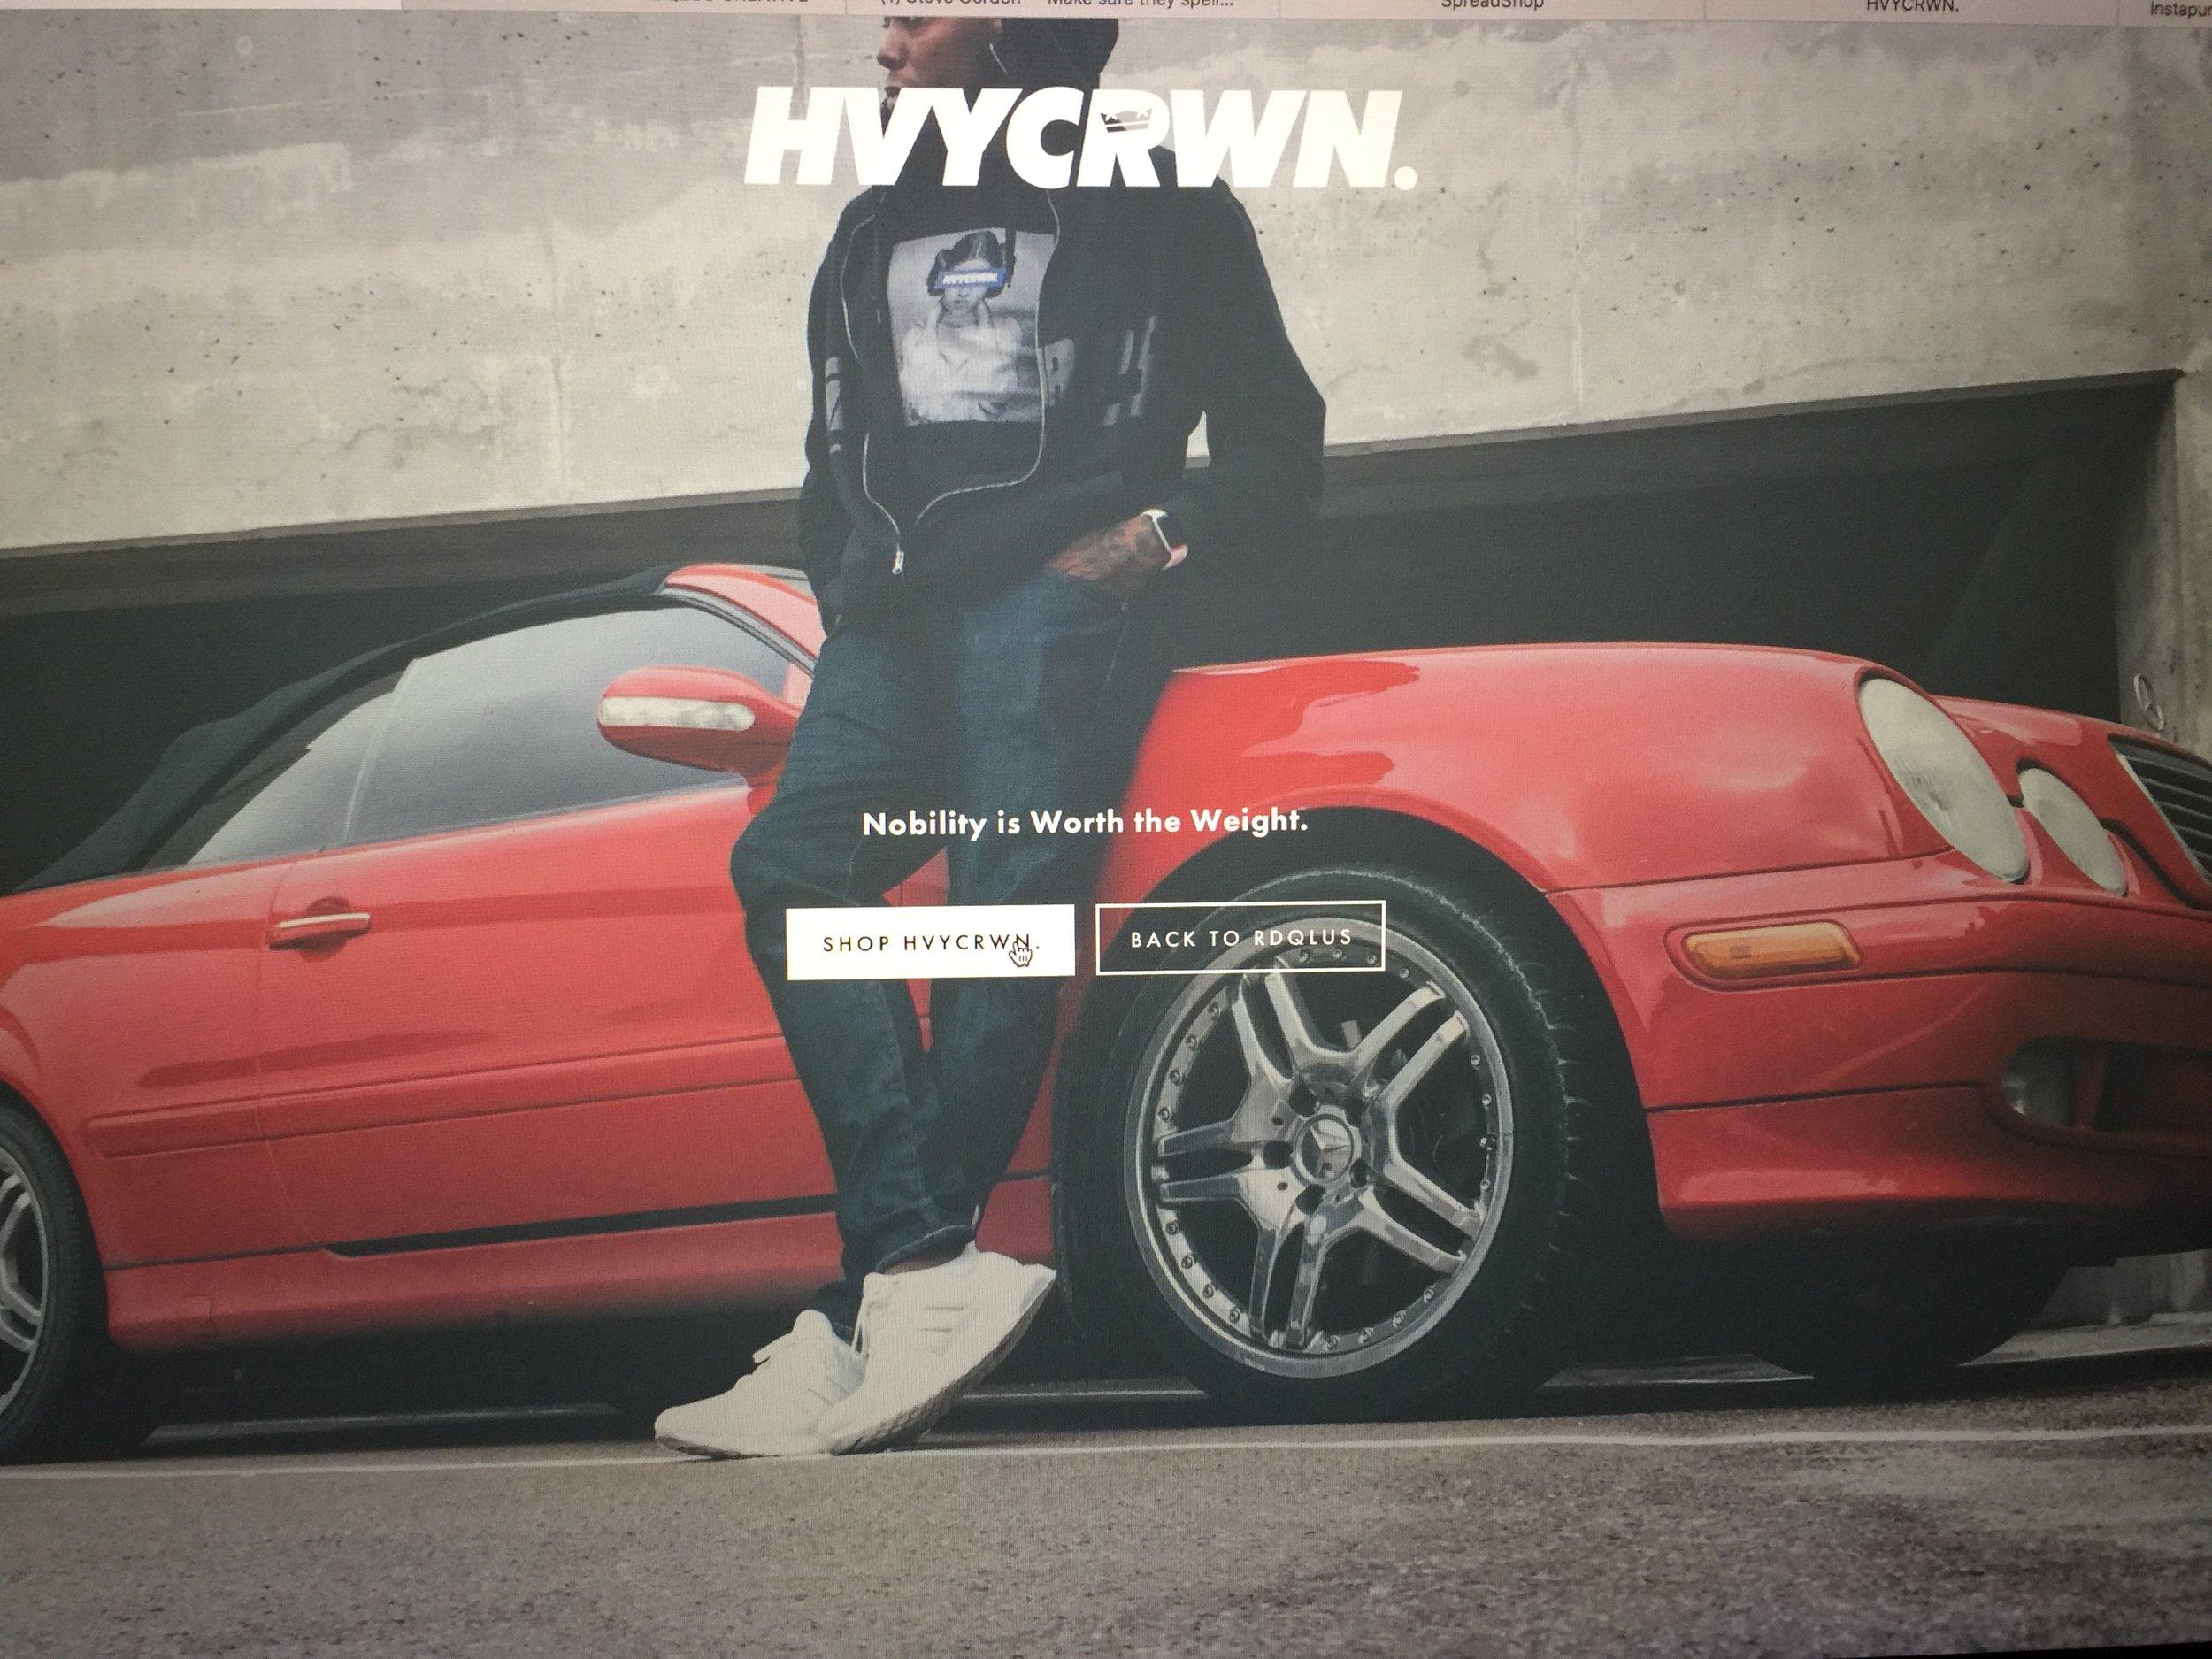 170127-HVYCRWN-5.JPG